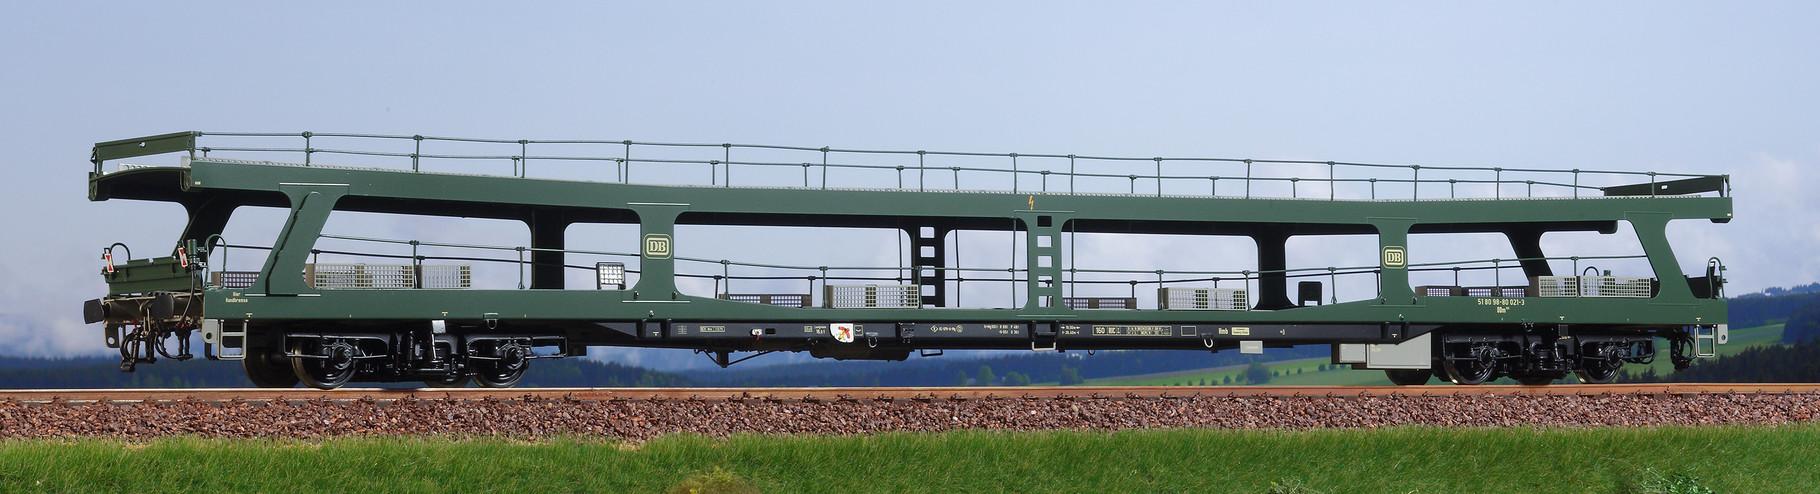 Spur 0, DB Autotransportwaggon DDm 915, chromoxydgrün, Epoche IV